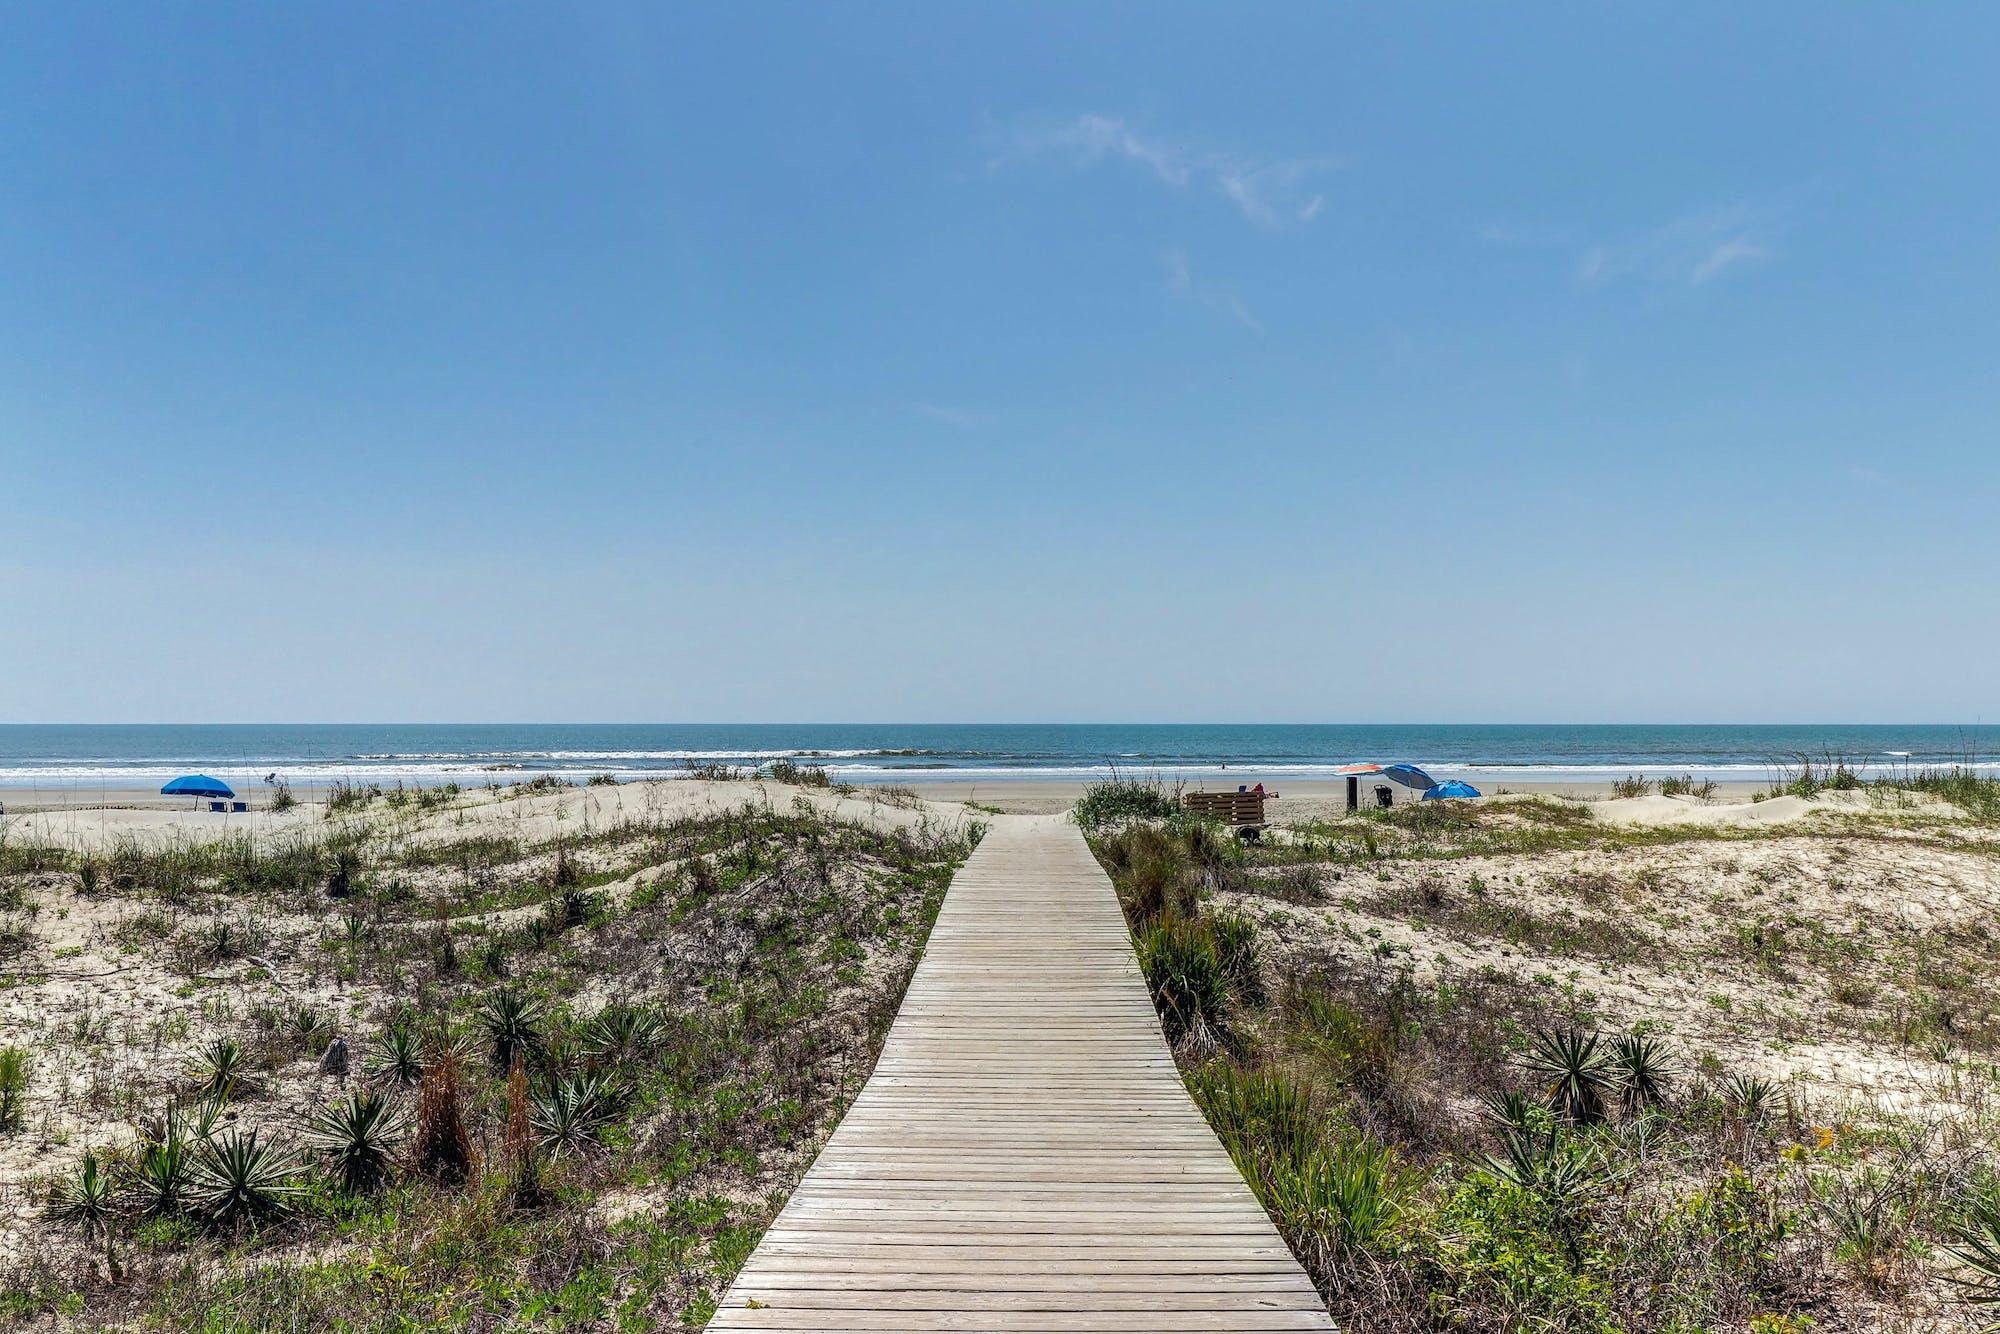 Boardwalk leading to the beach in Kiawah Island, South Carolina